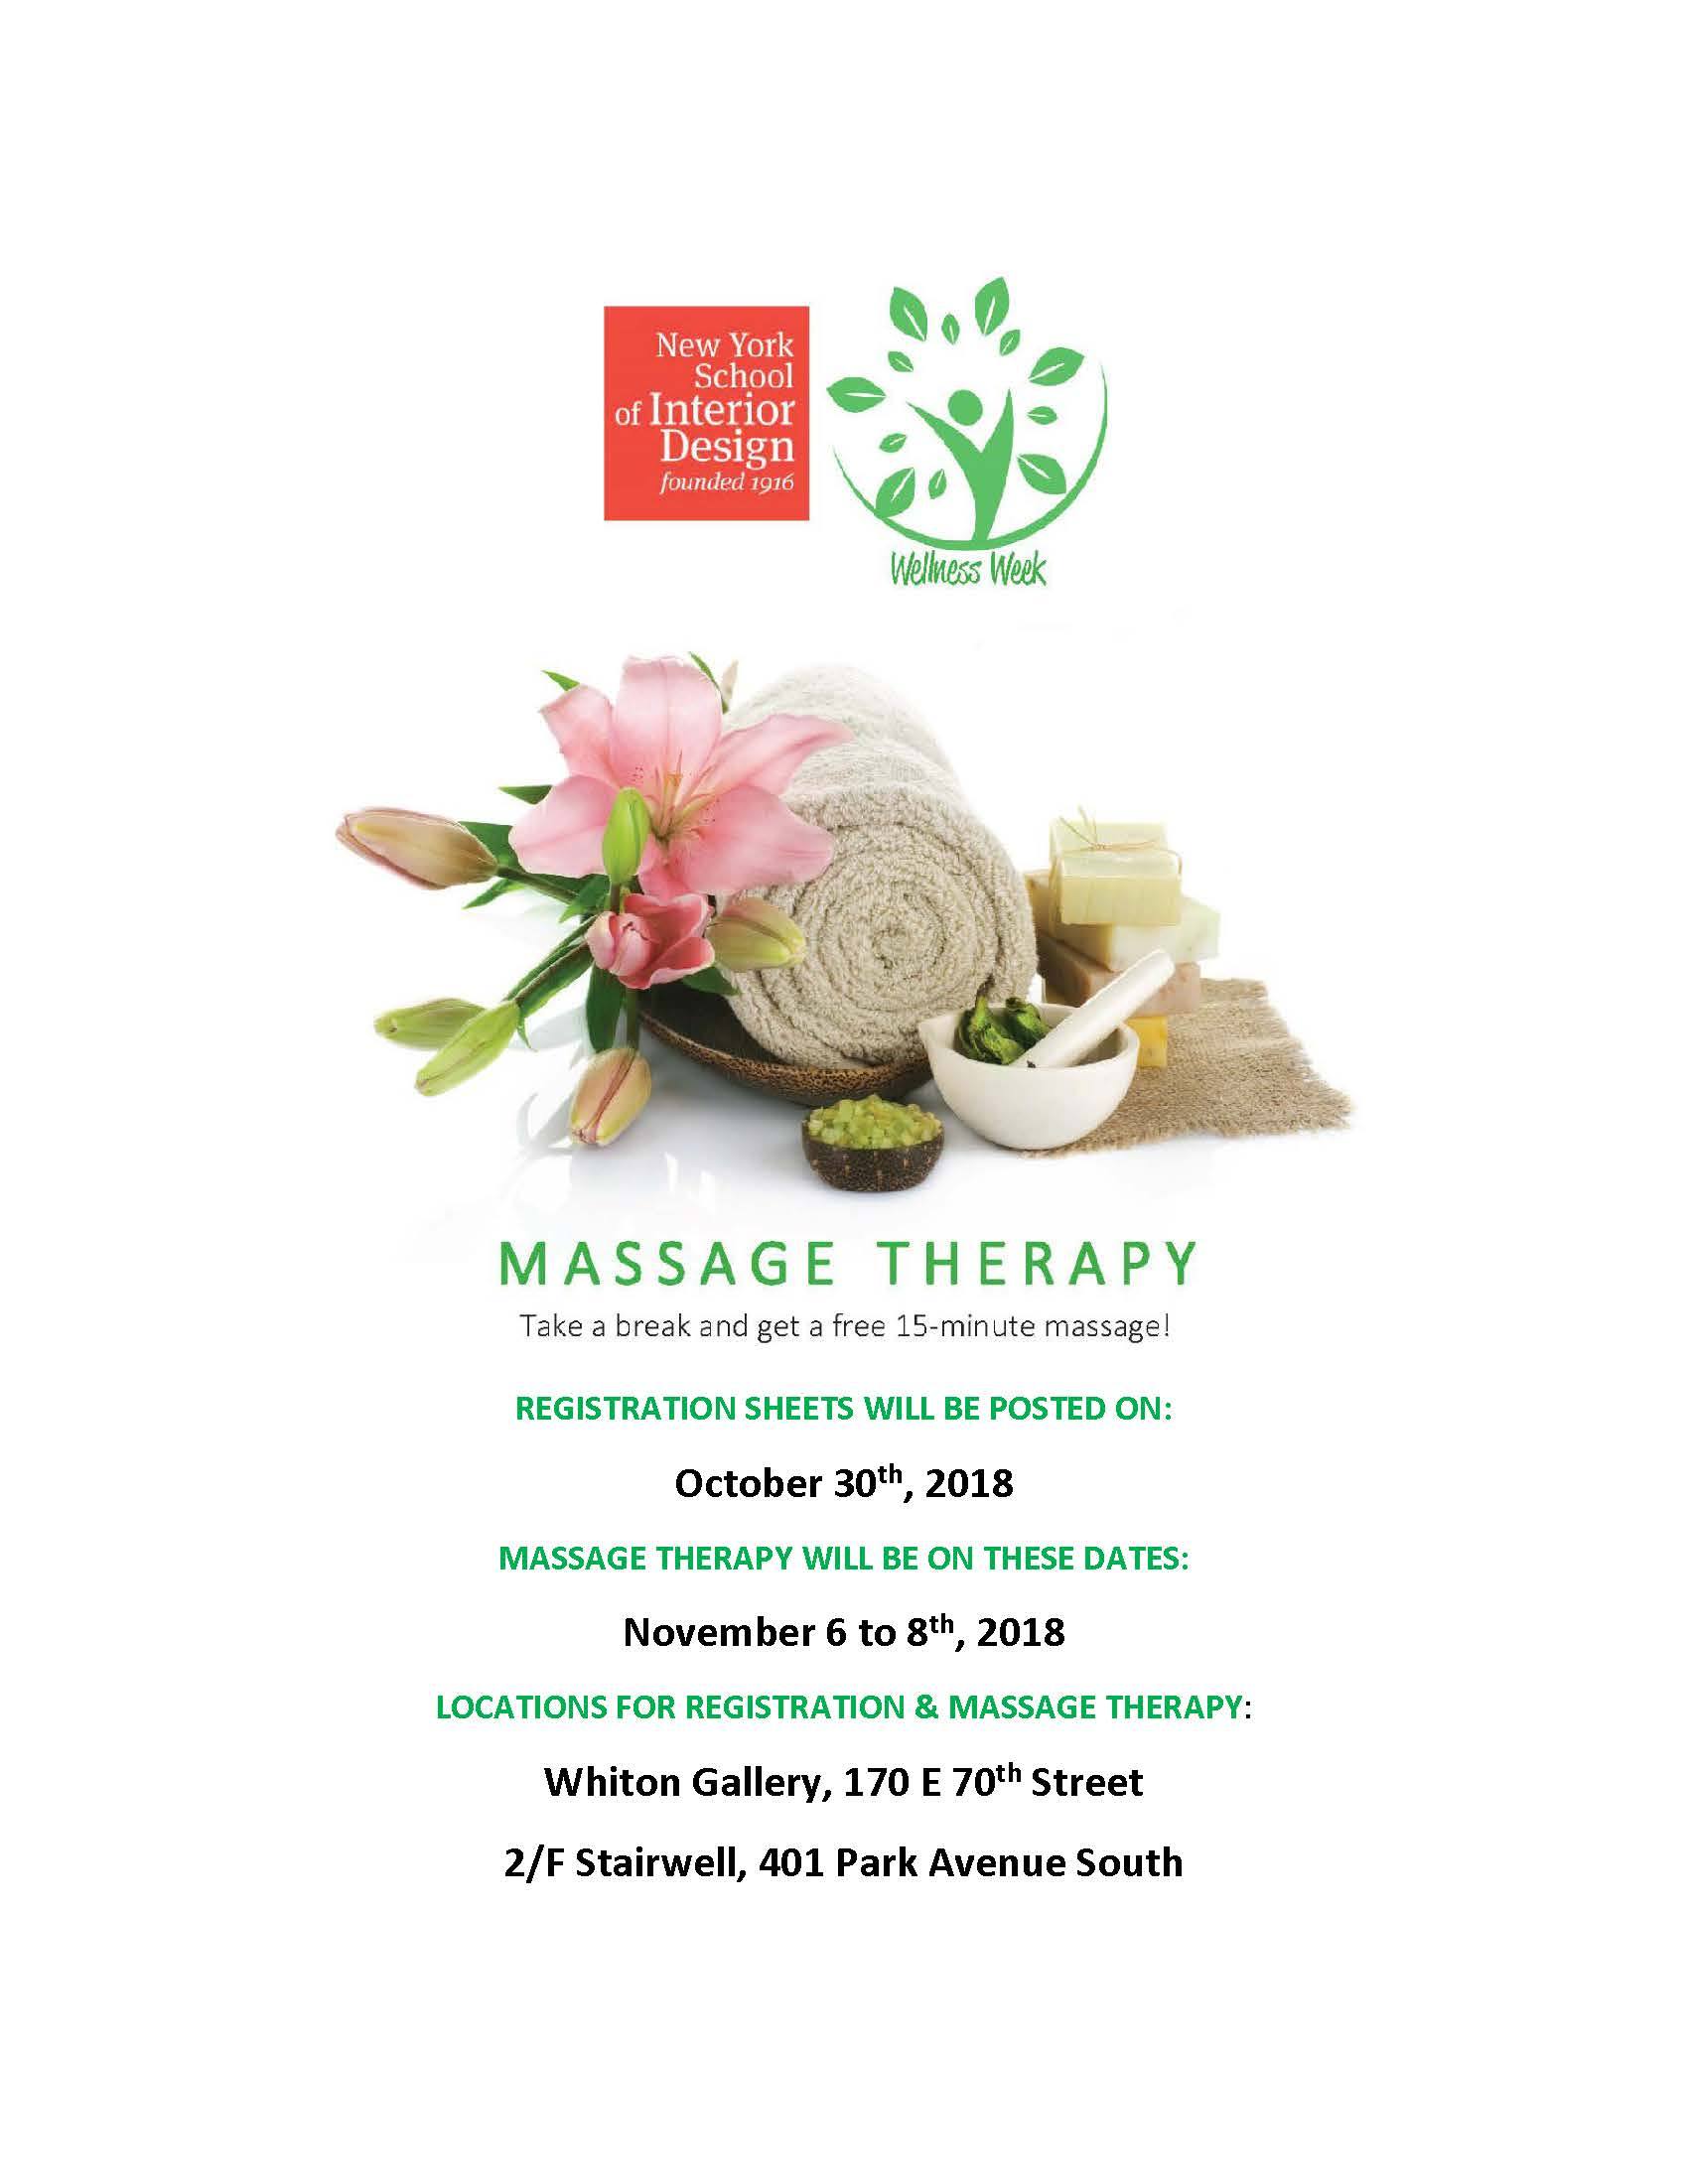 Massage Therapy flier.jpg